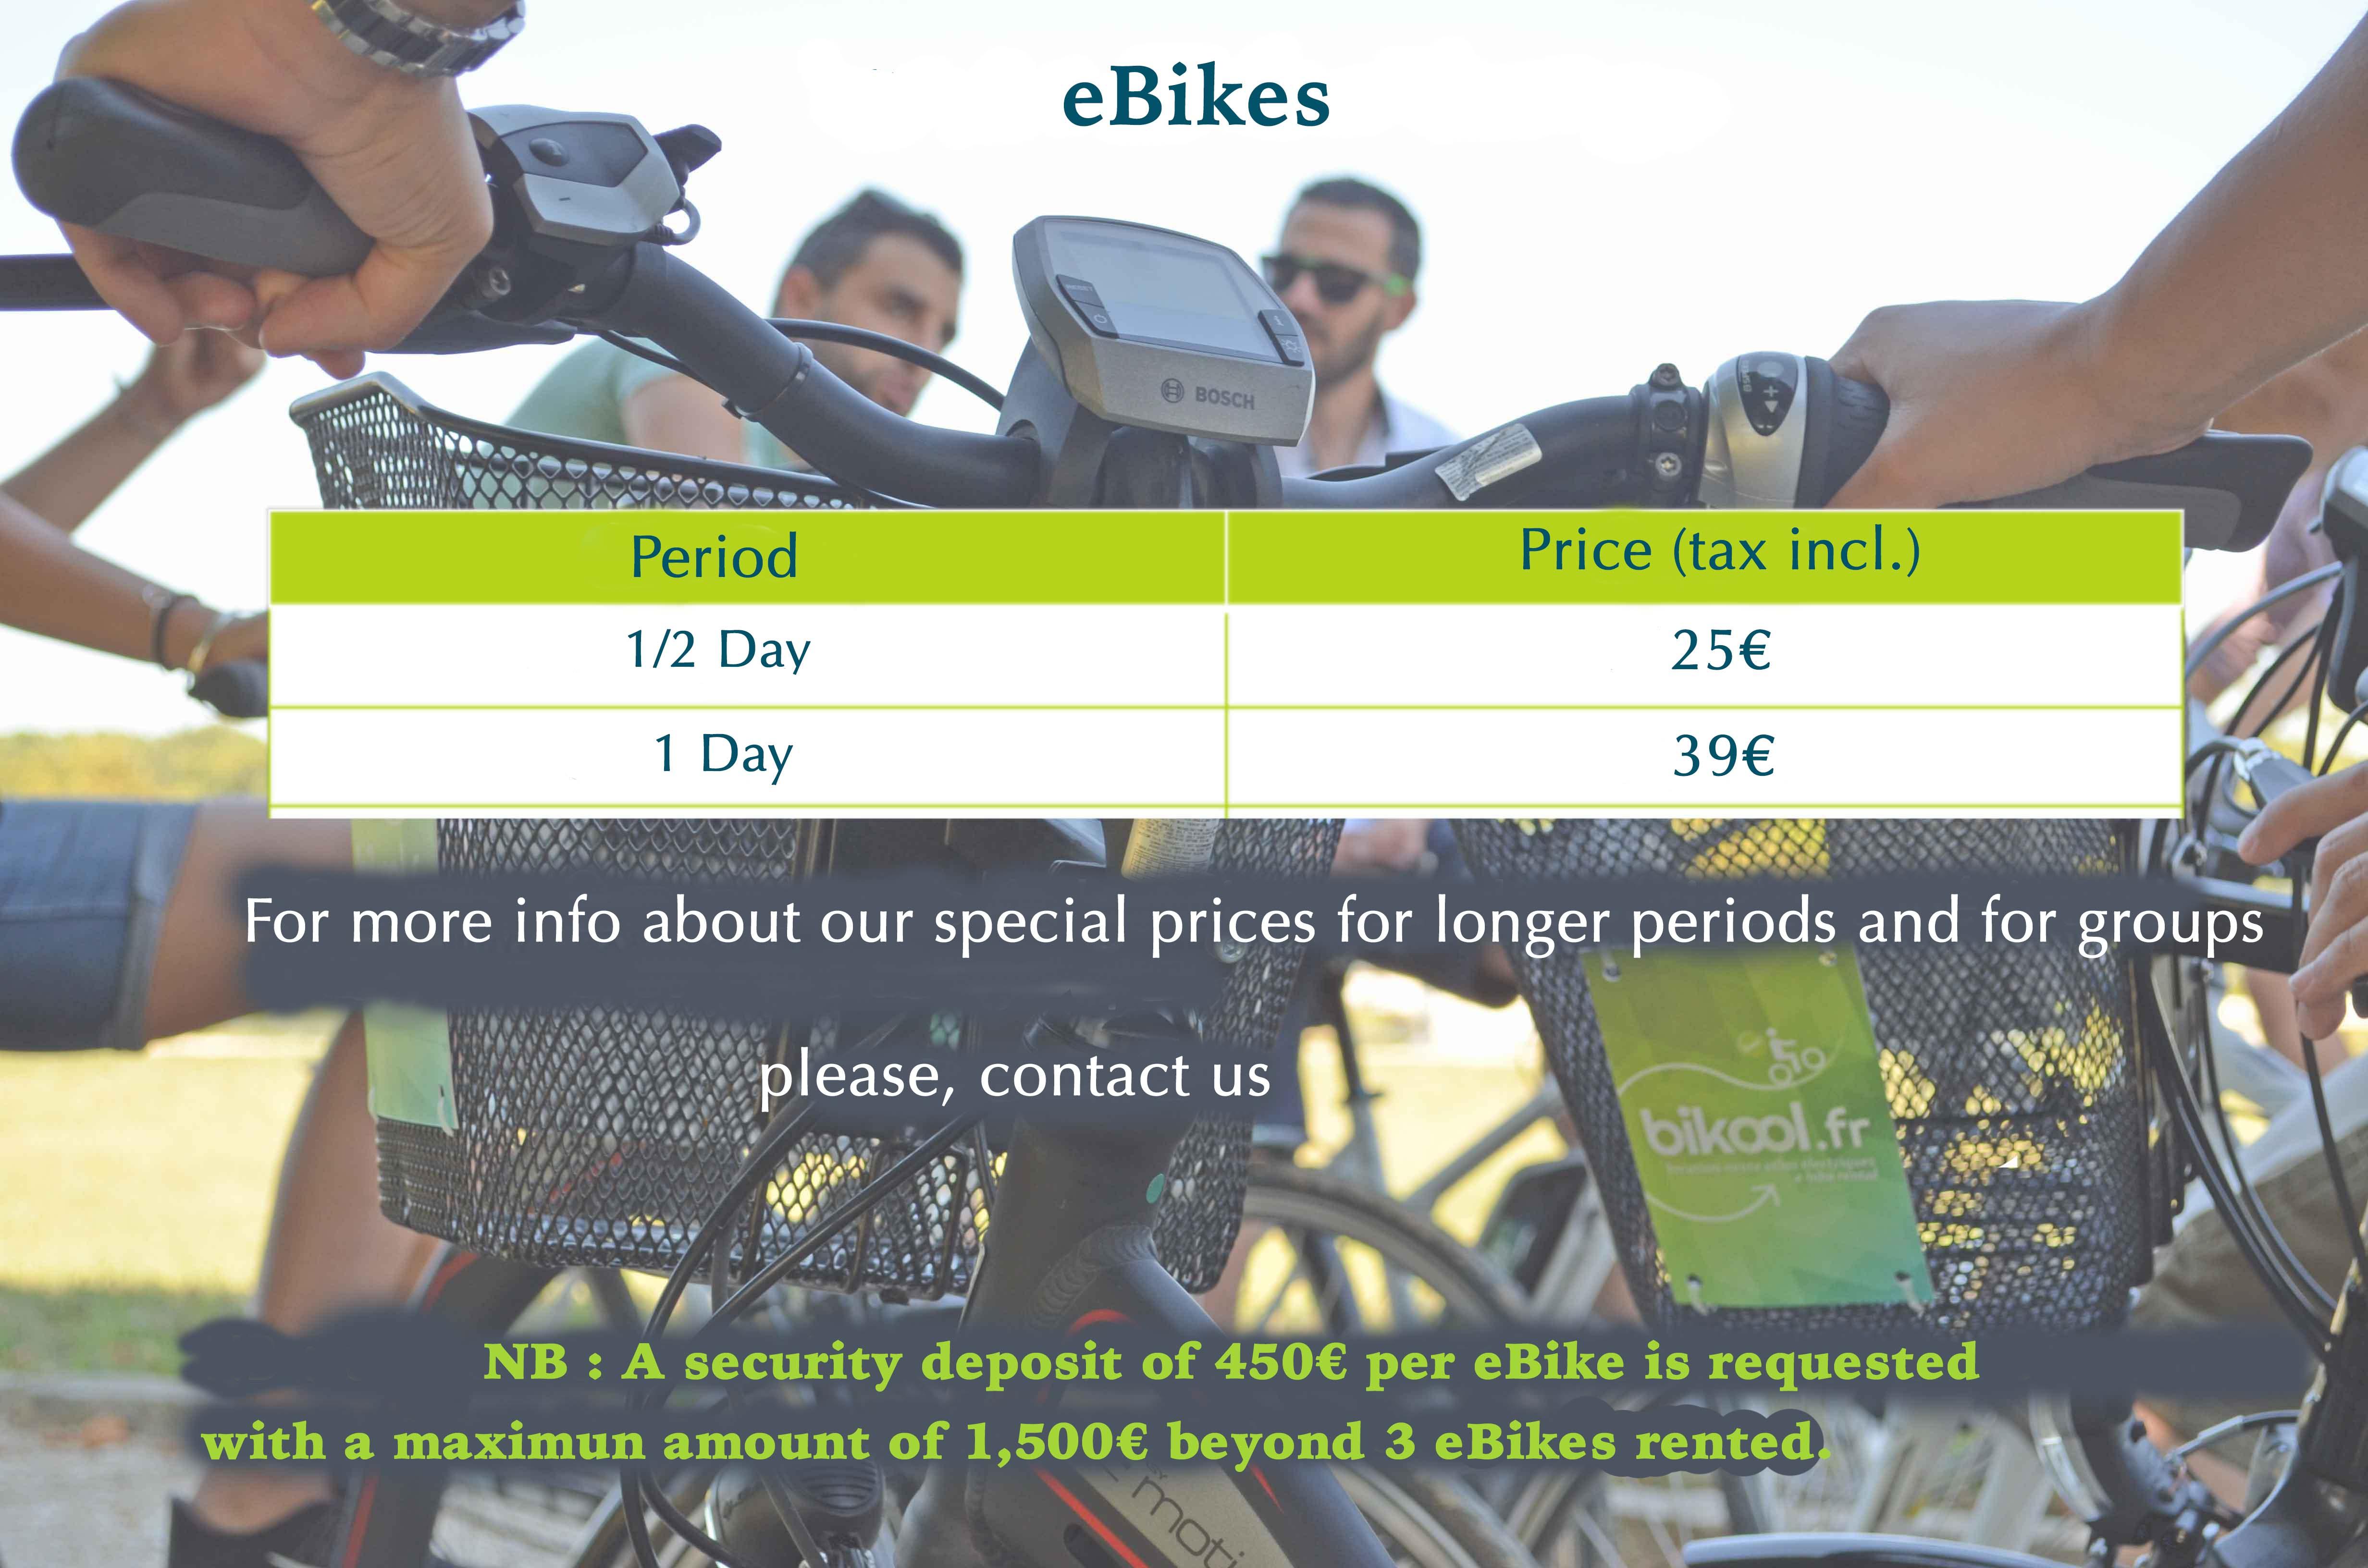 eBikes rental fees